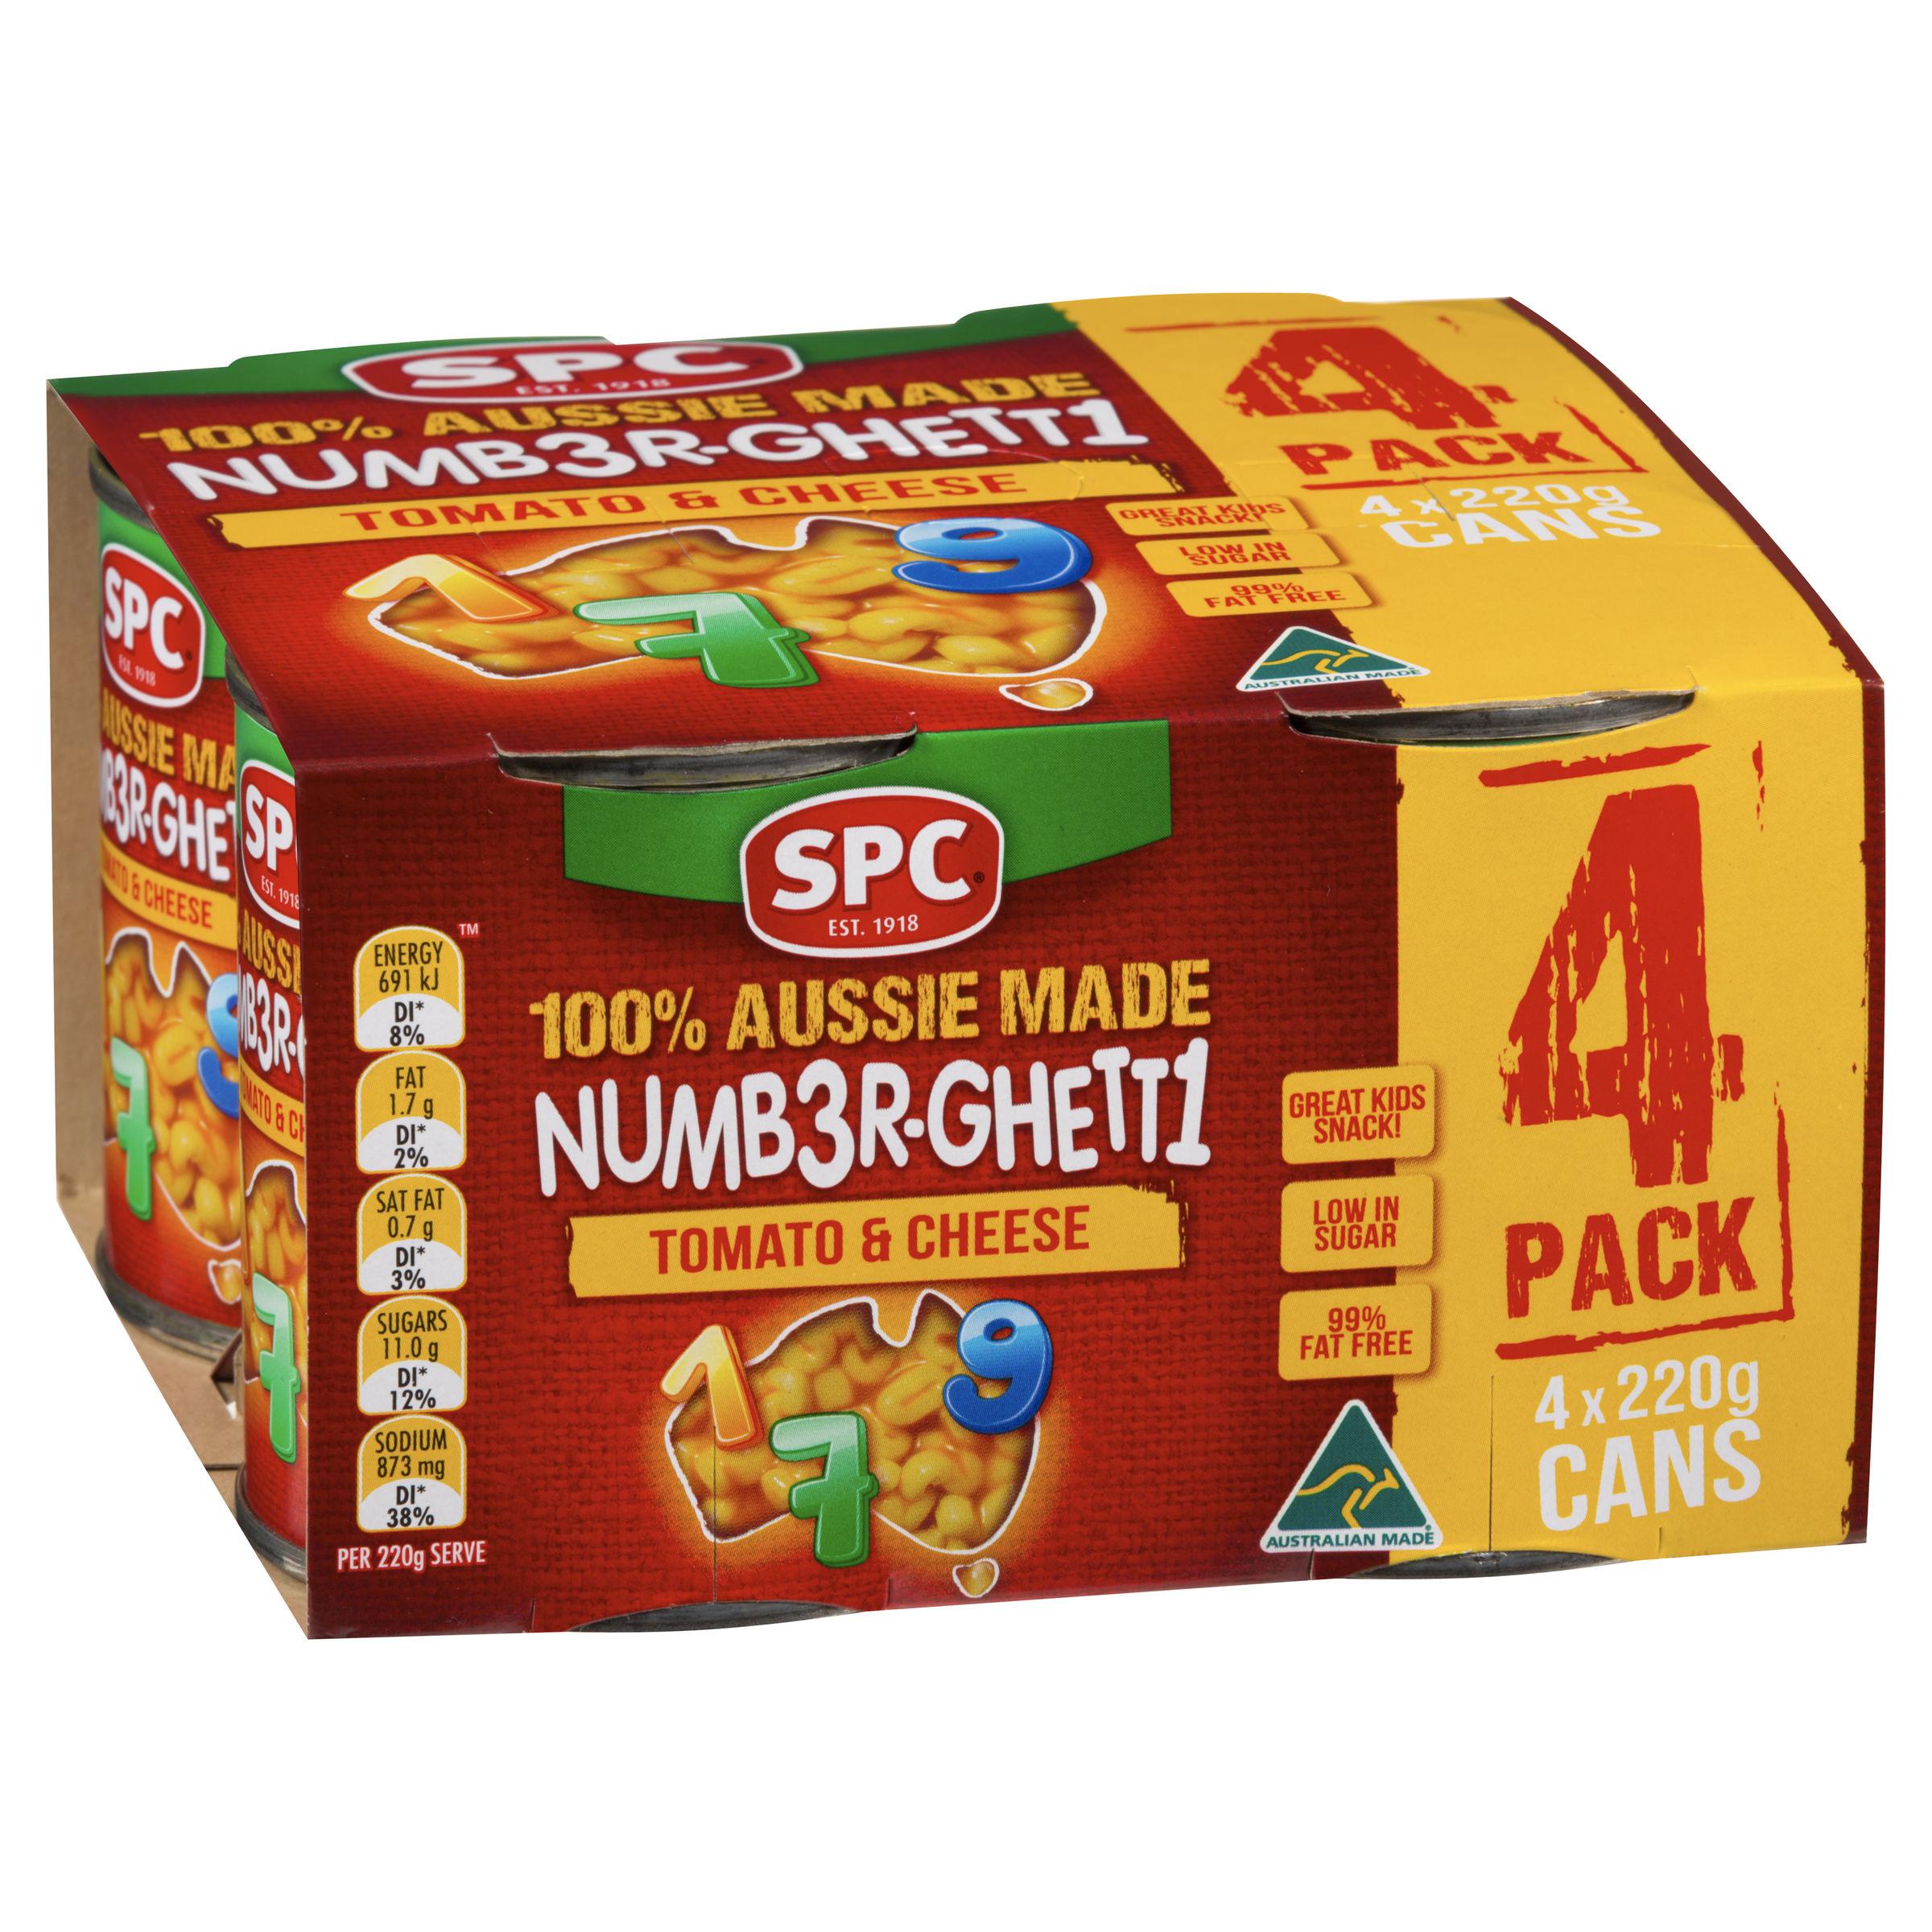 SPC Numberghetti 4 x 220g